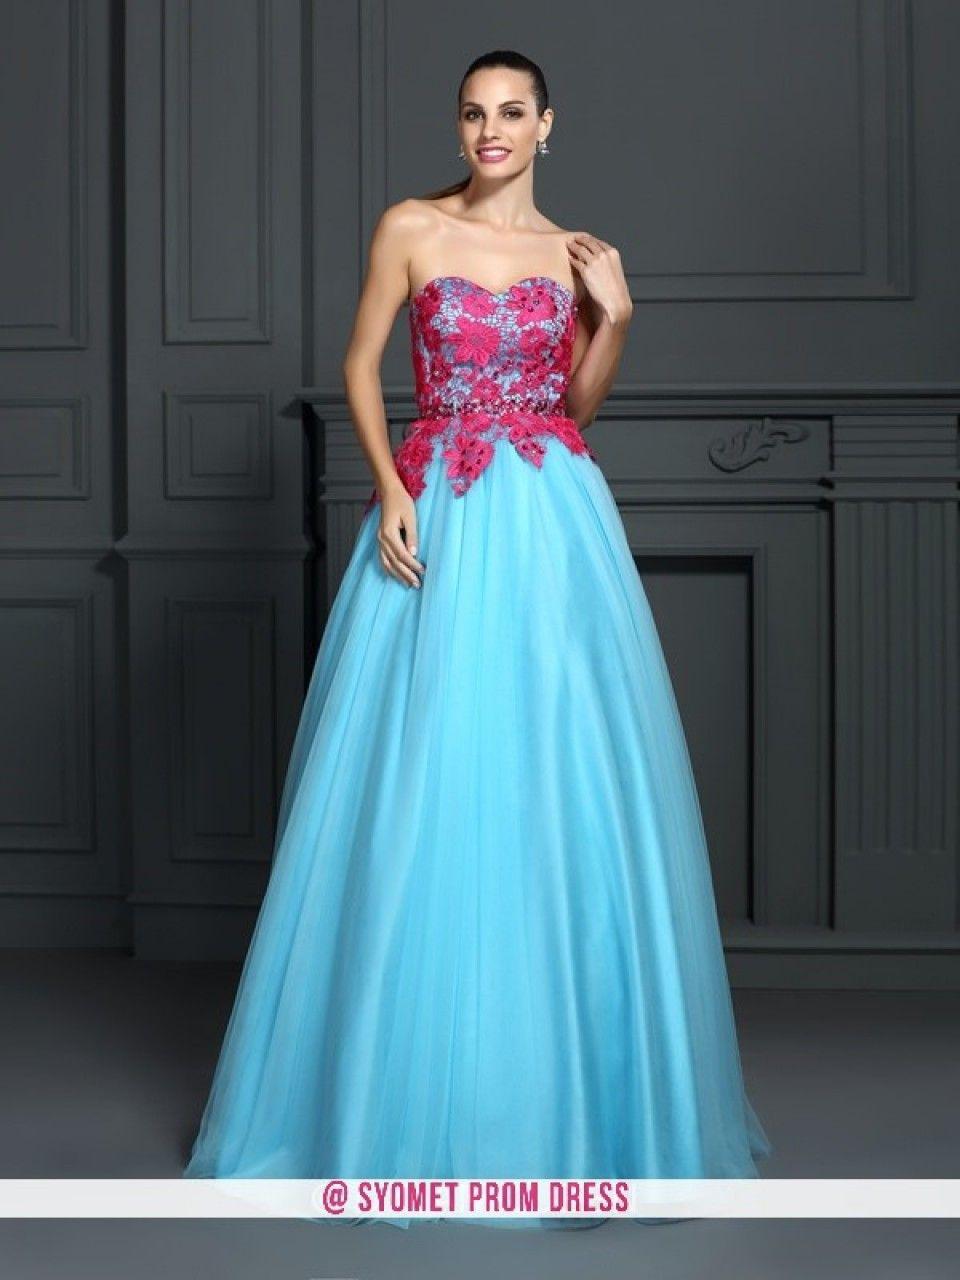 So chic promdress promtrends prom syomet prom dresses